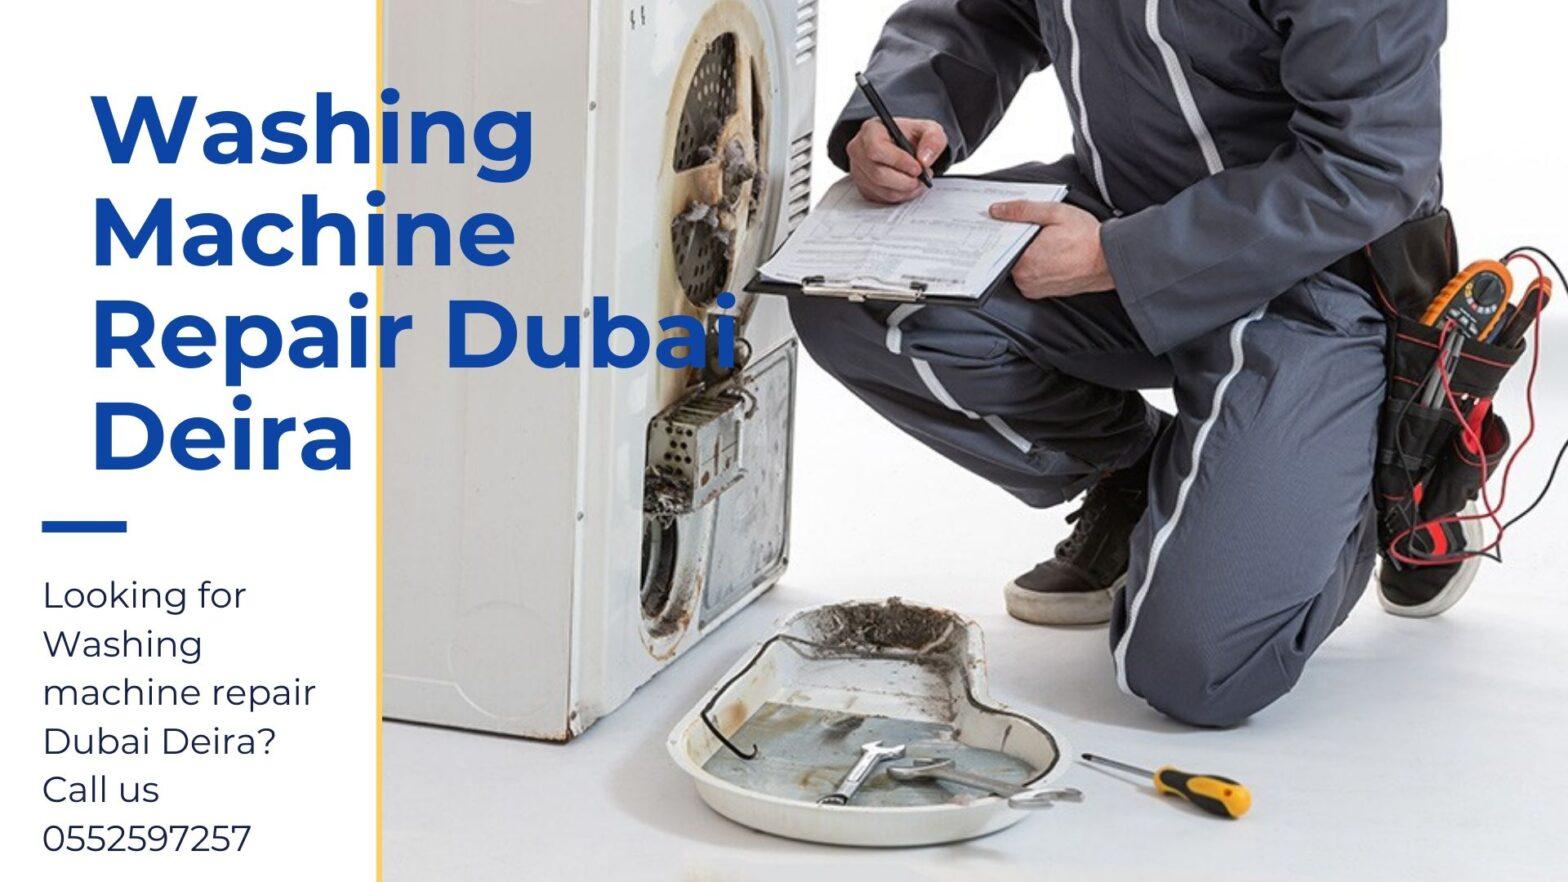 Washing machine repair Dubai Deira